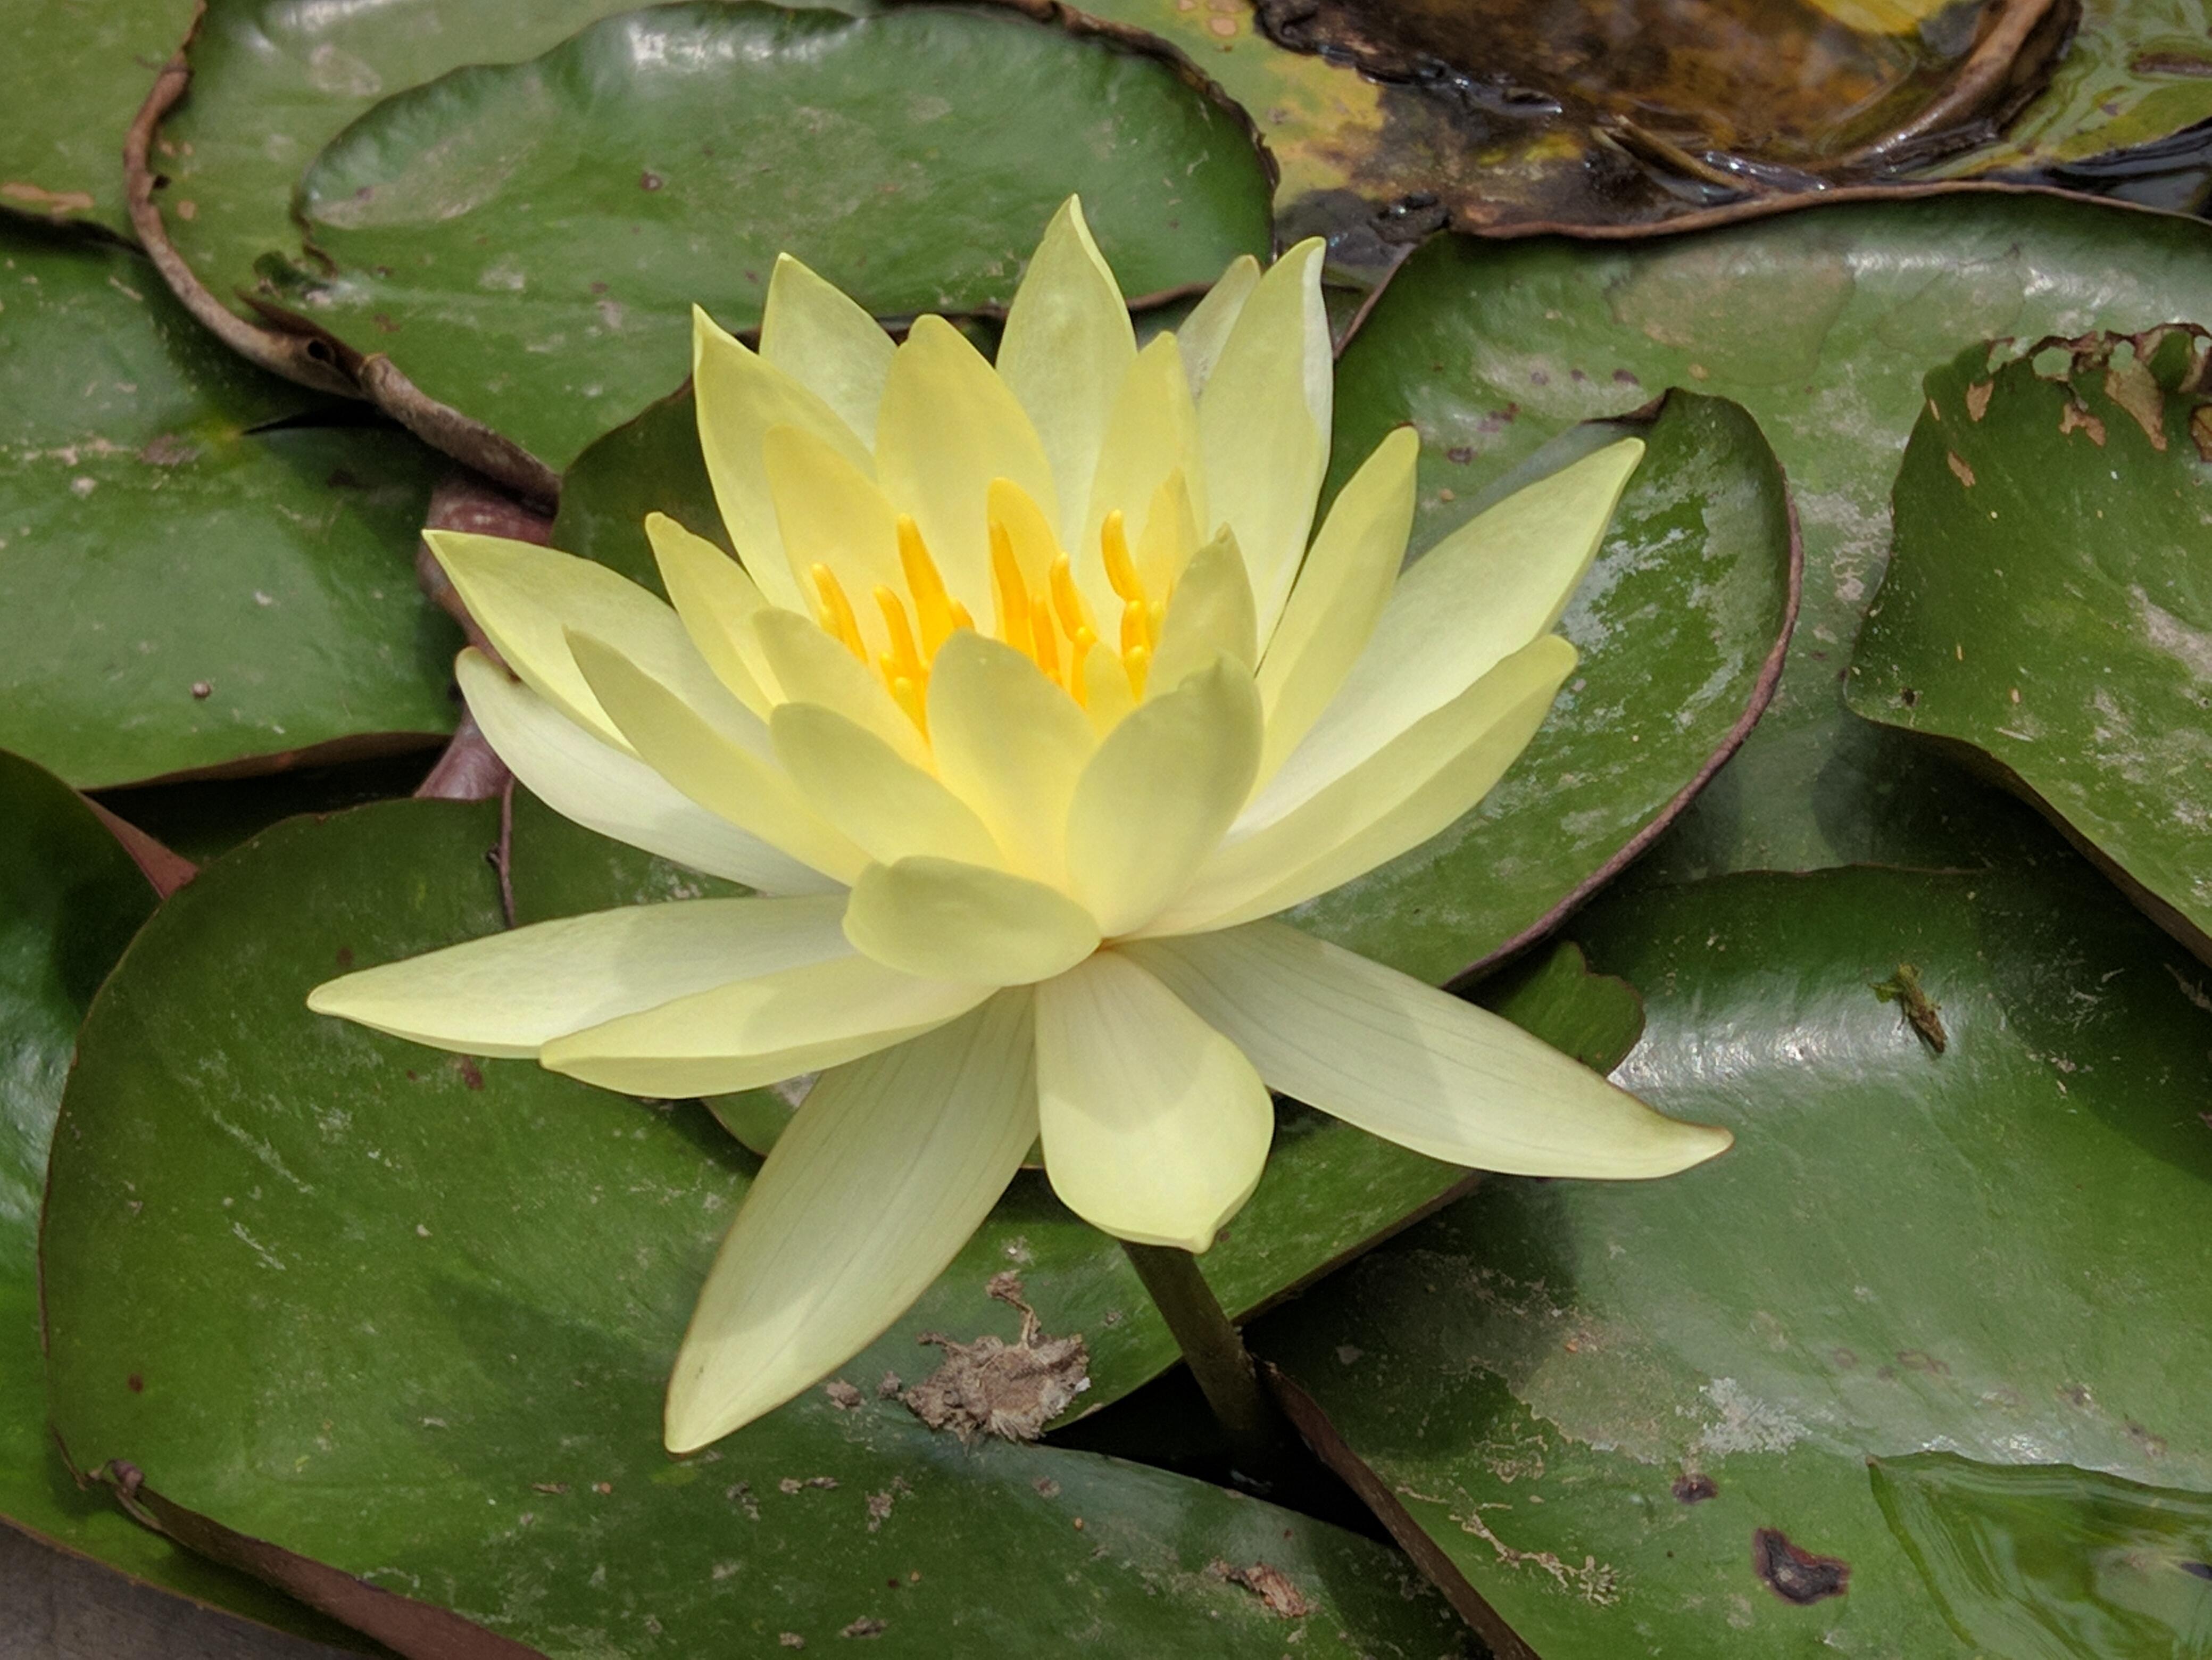 Fileyellow Lotusg Wikimedia Commons